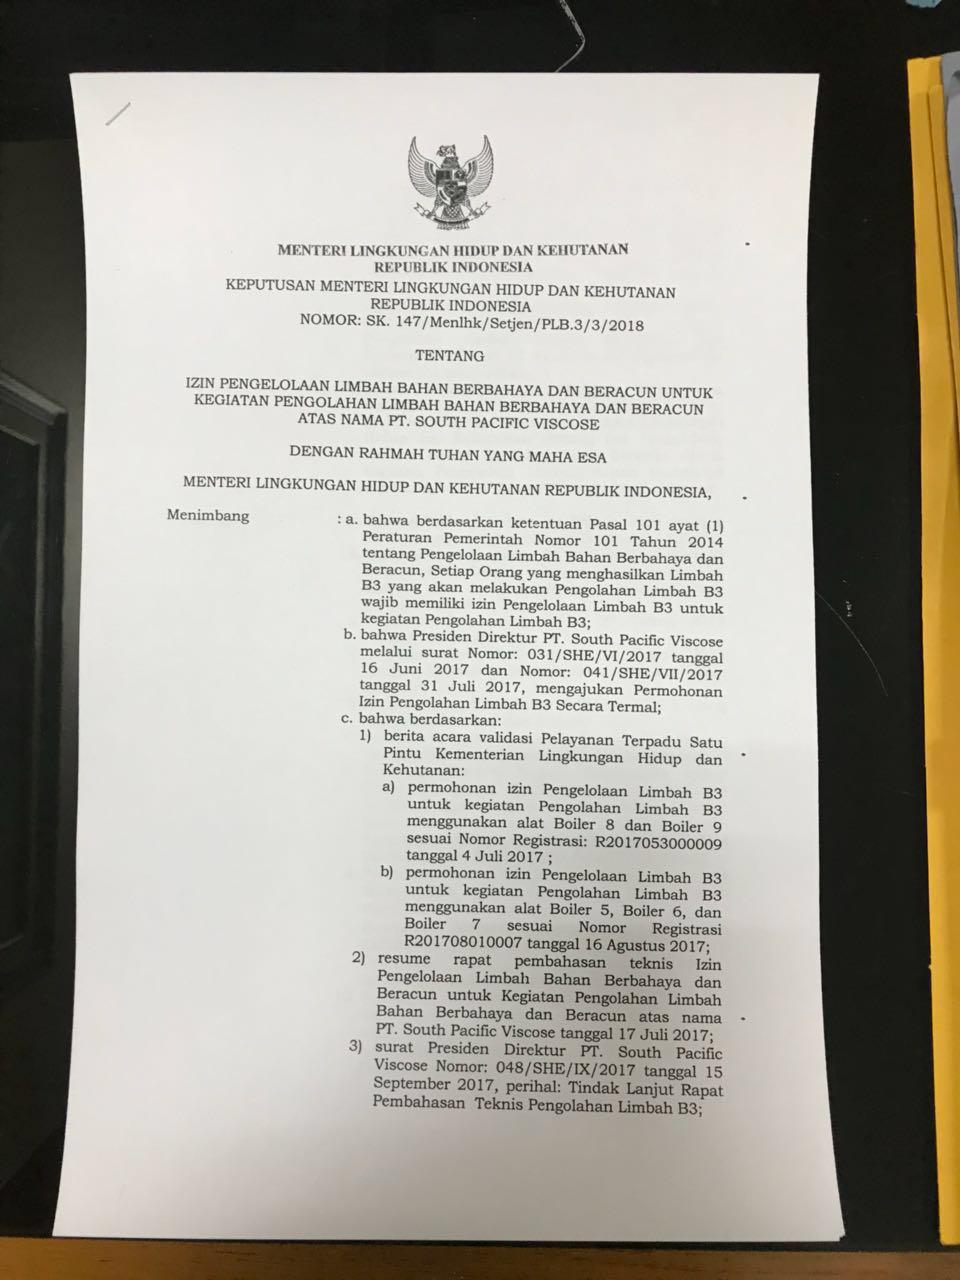 Kerap Dituding Biang Pencemaran Lingkungan, PT SPV Dapat SK dari KLHK